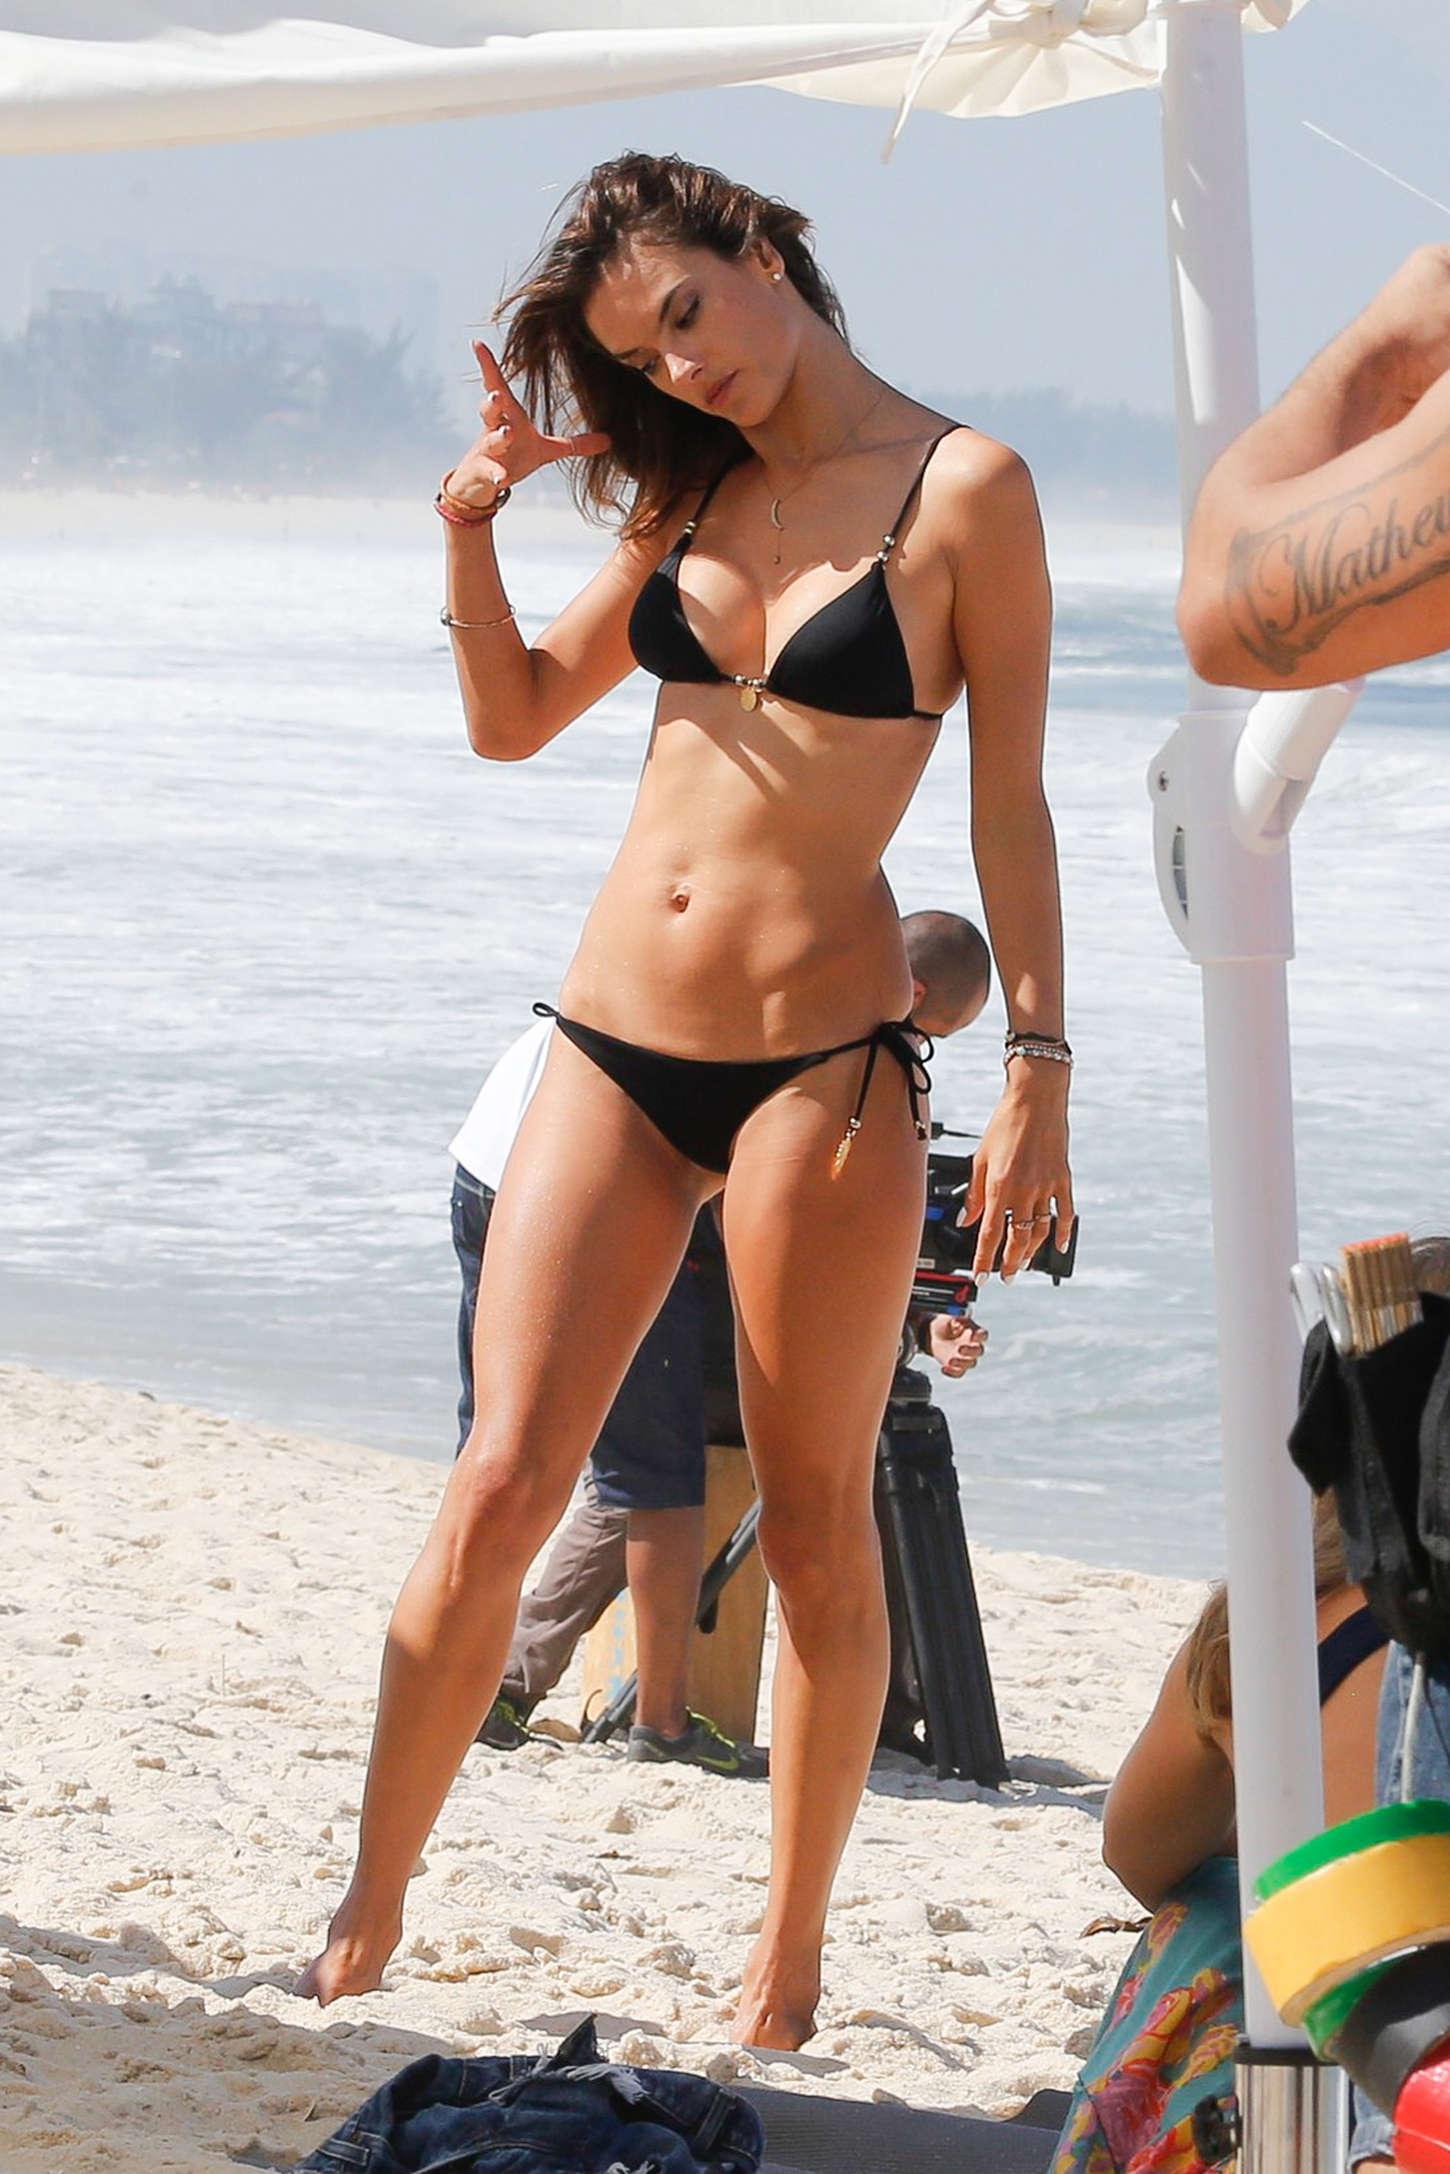 Bikini Alessandra Ambrosio nudes (81 photo), Pussy, Sideboobs, Selfie, butt 2019